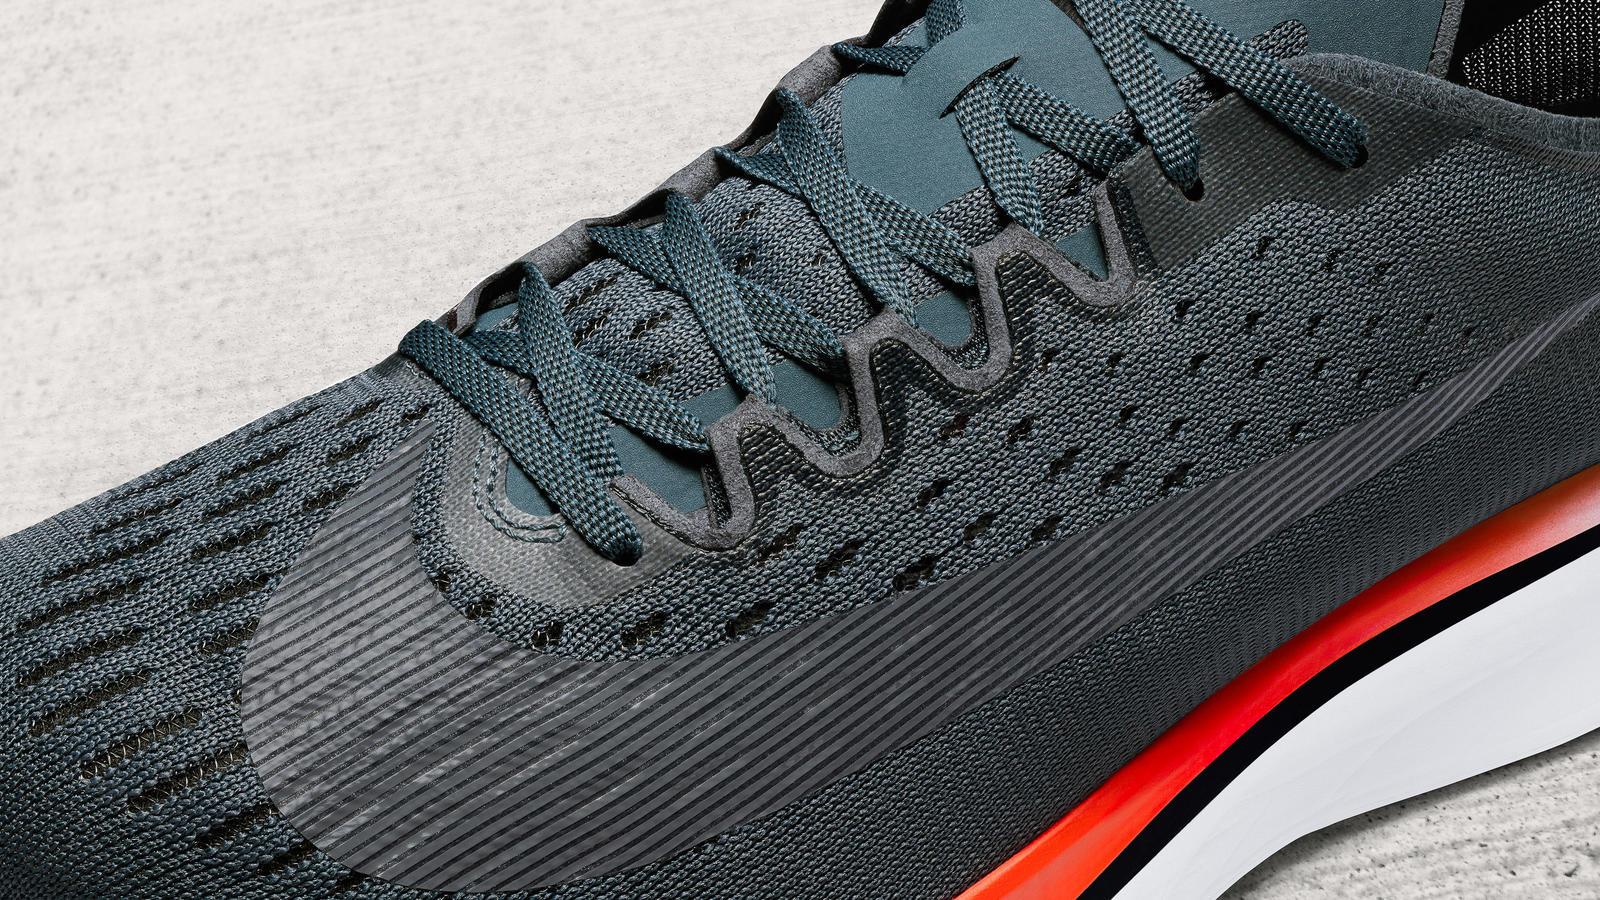 Nike Zoom Vaporfly 4% 1